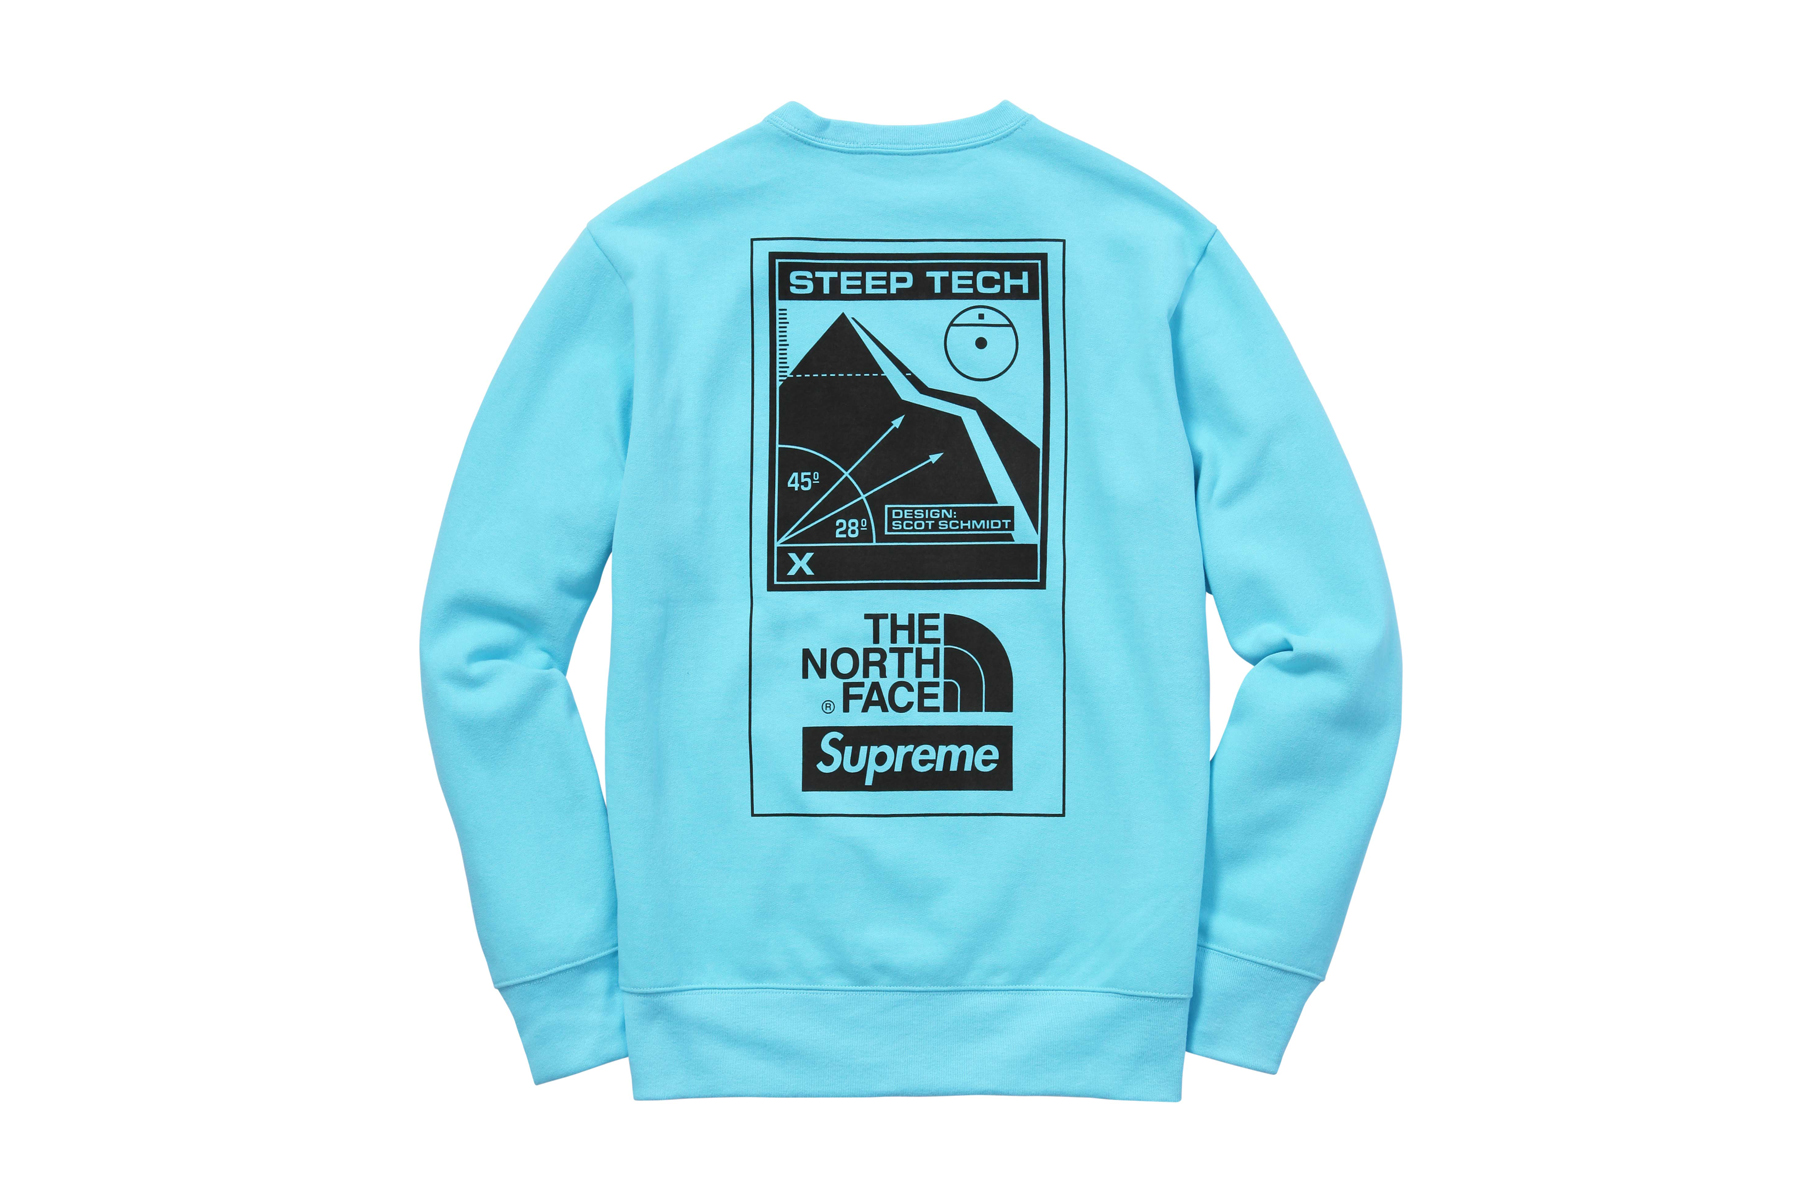 c799509e supreme north face steep tech t shirt - Marwood VeneerMarwood Veneer